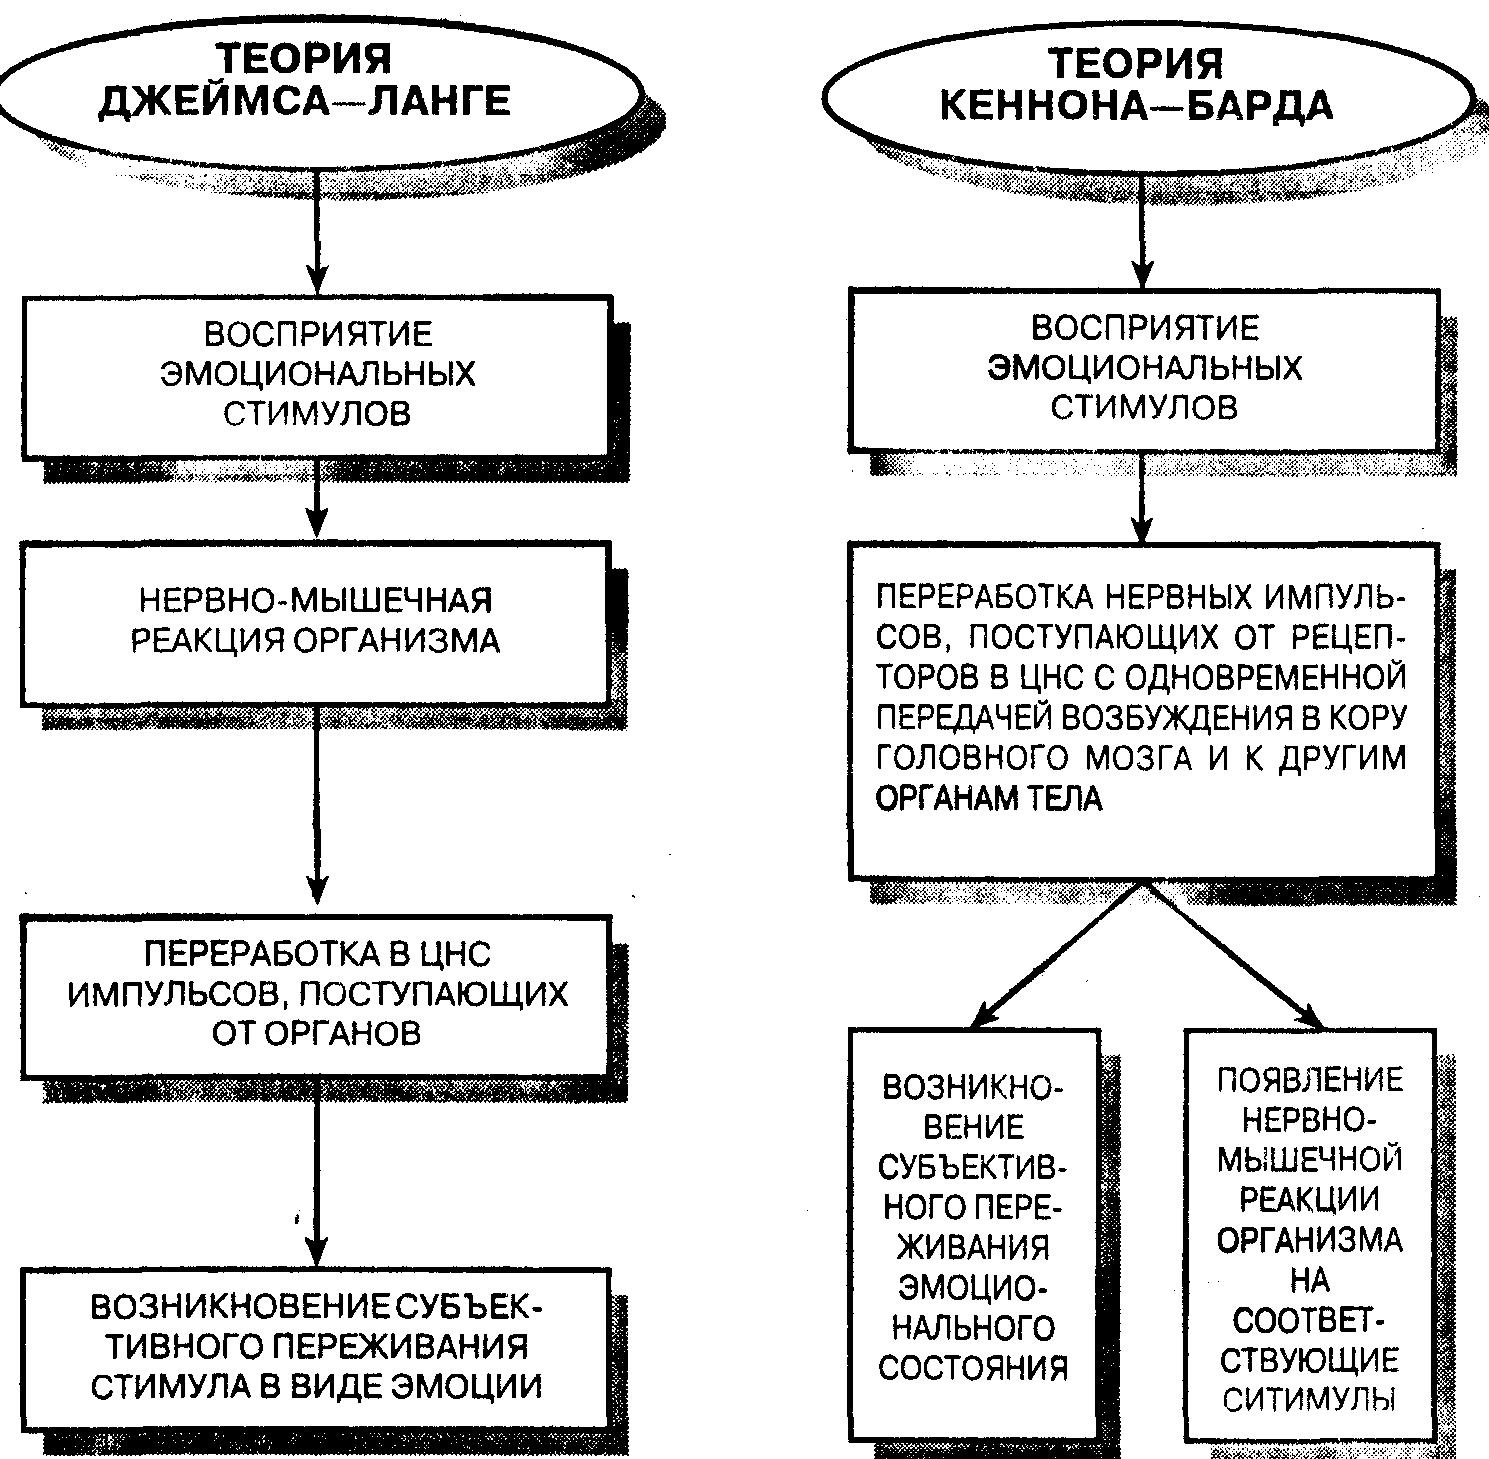 теория джеймса-ланге